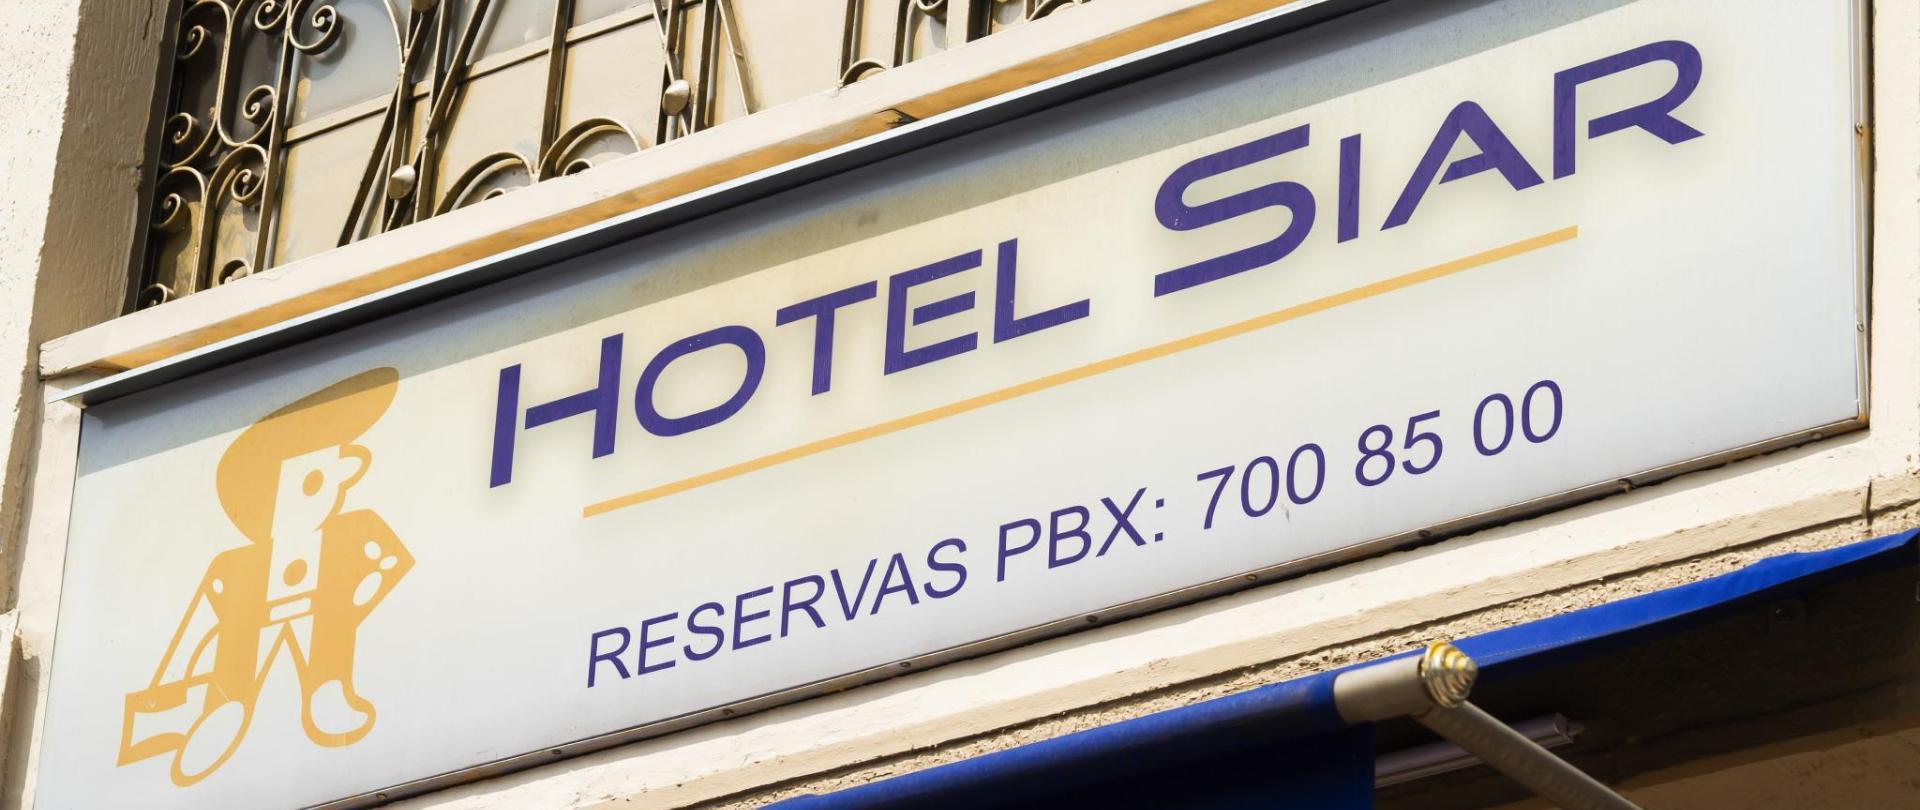 Hotel_Siar-7975.jpg